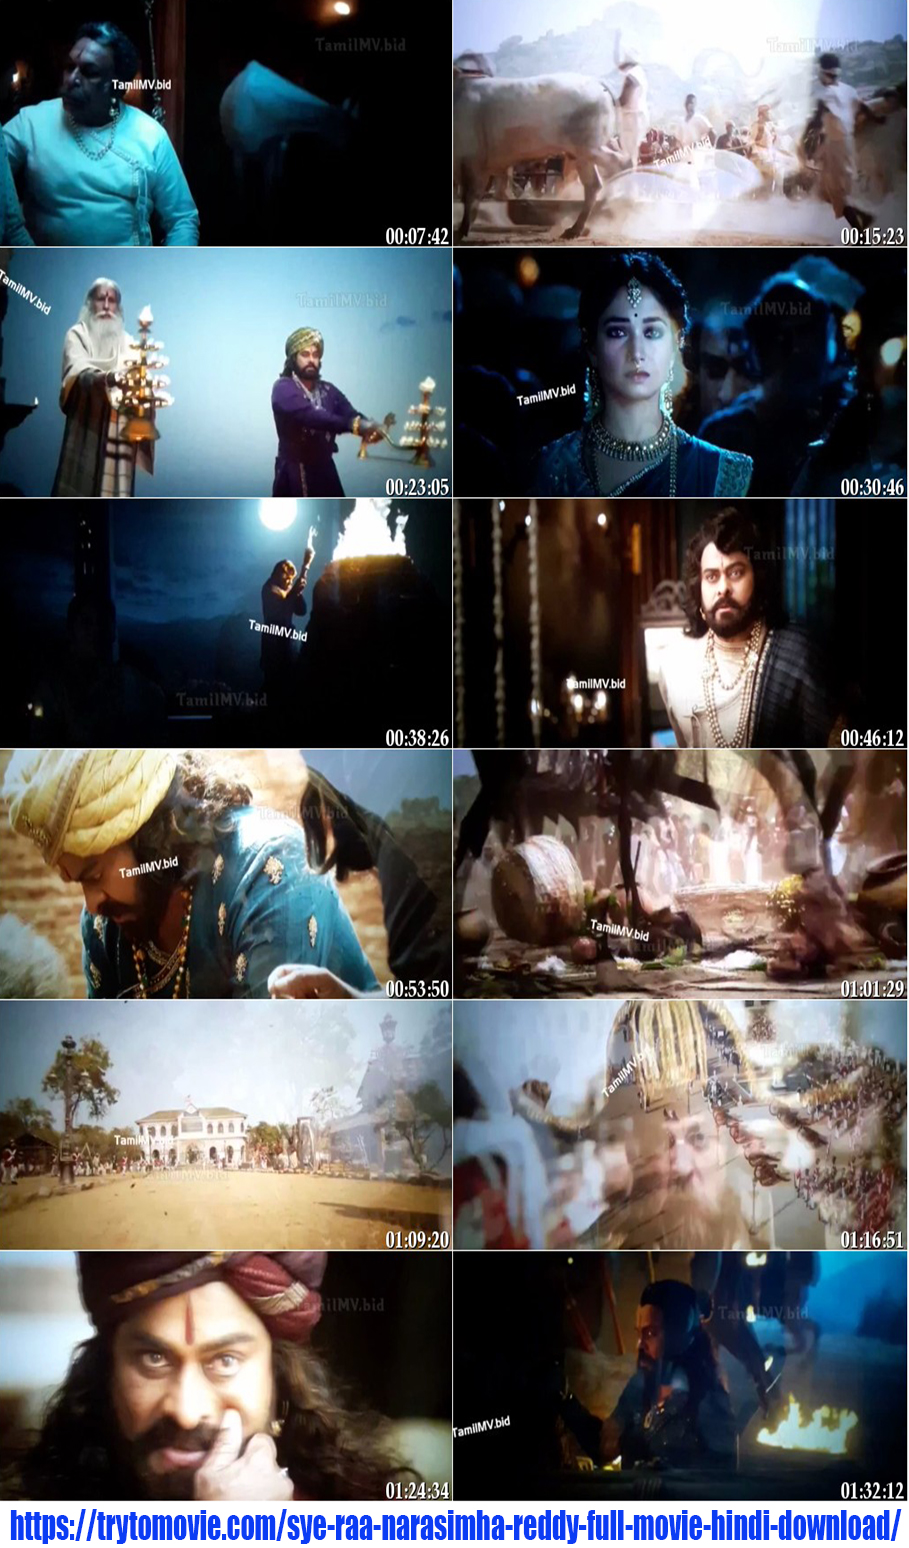 Sye Raa Narasimha Reddy Full Movie in Hindi Screenshot